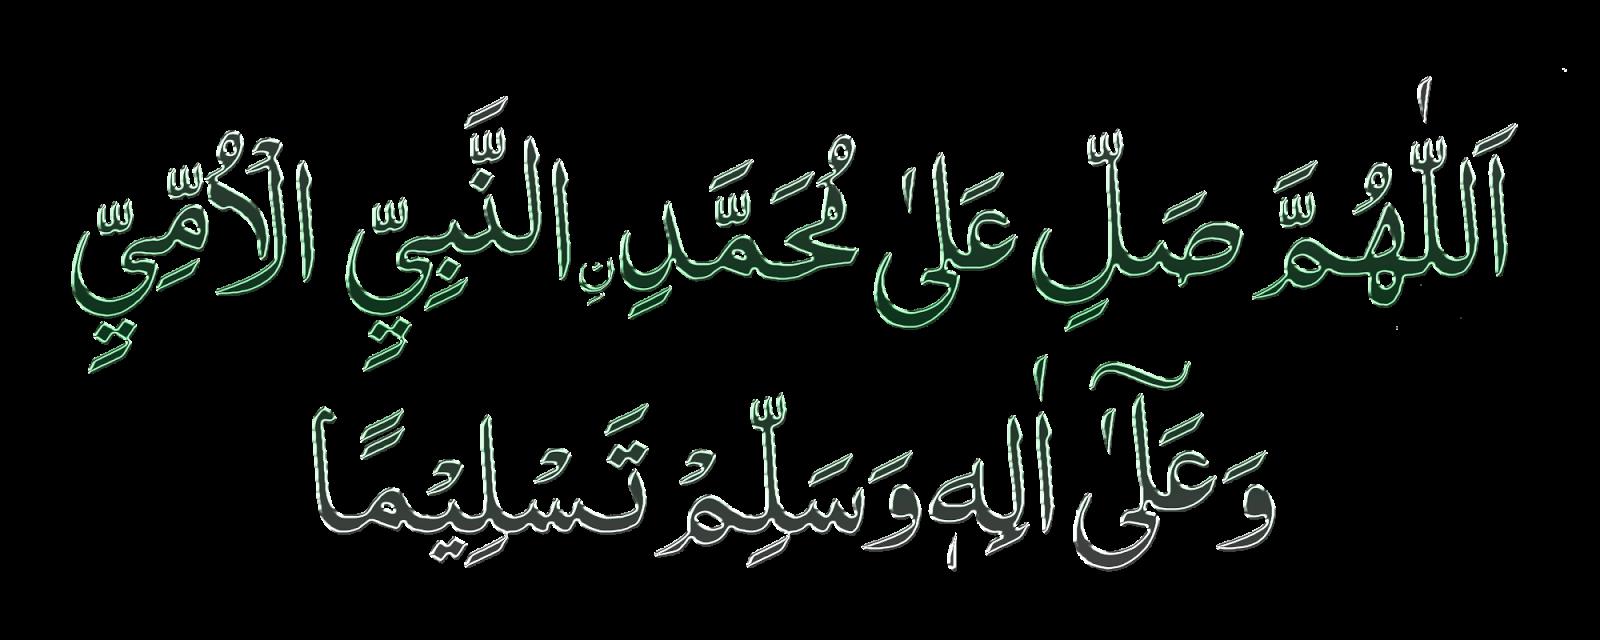 2 Al Baqarah The Cow Irfan Ul Quran Urdu Translation Audio